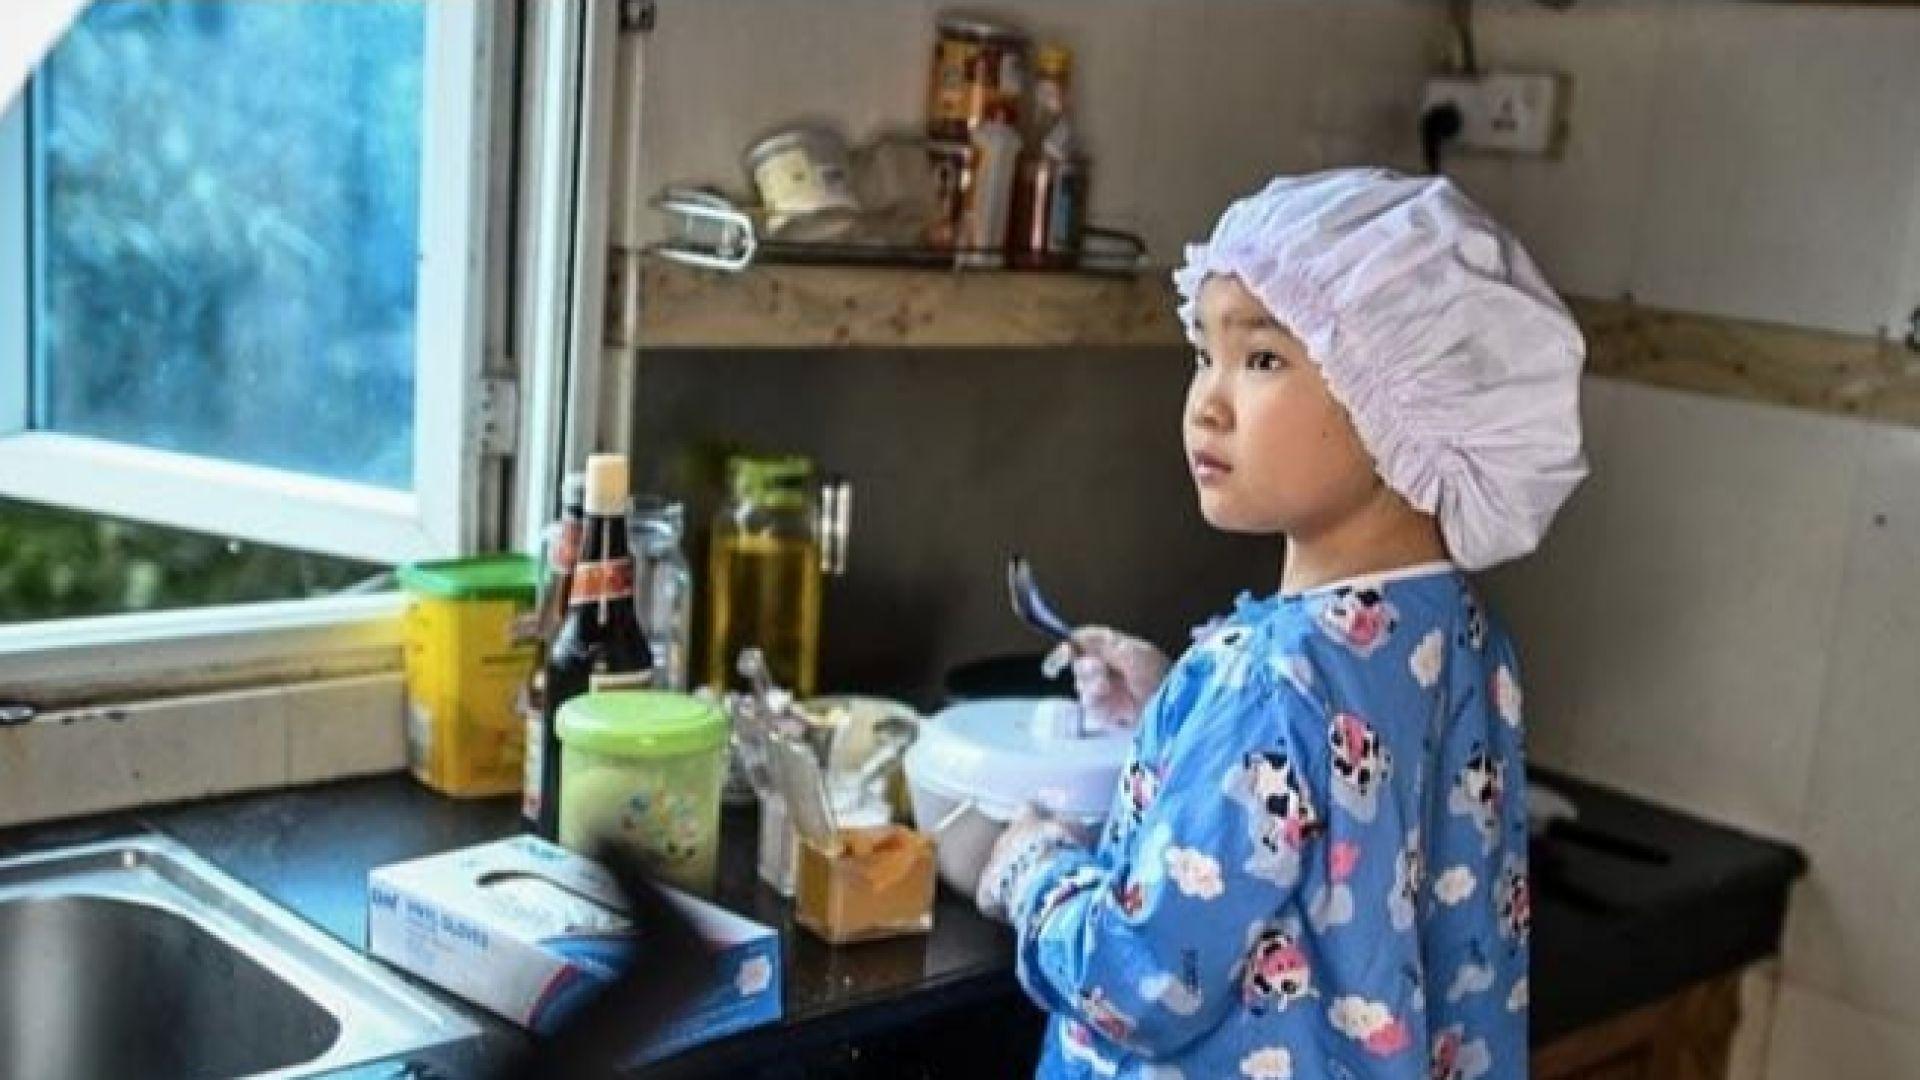 8-годишно момиче очарова интернет с готварските си способности